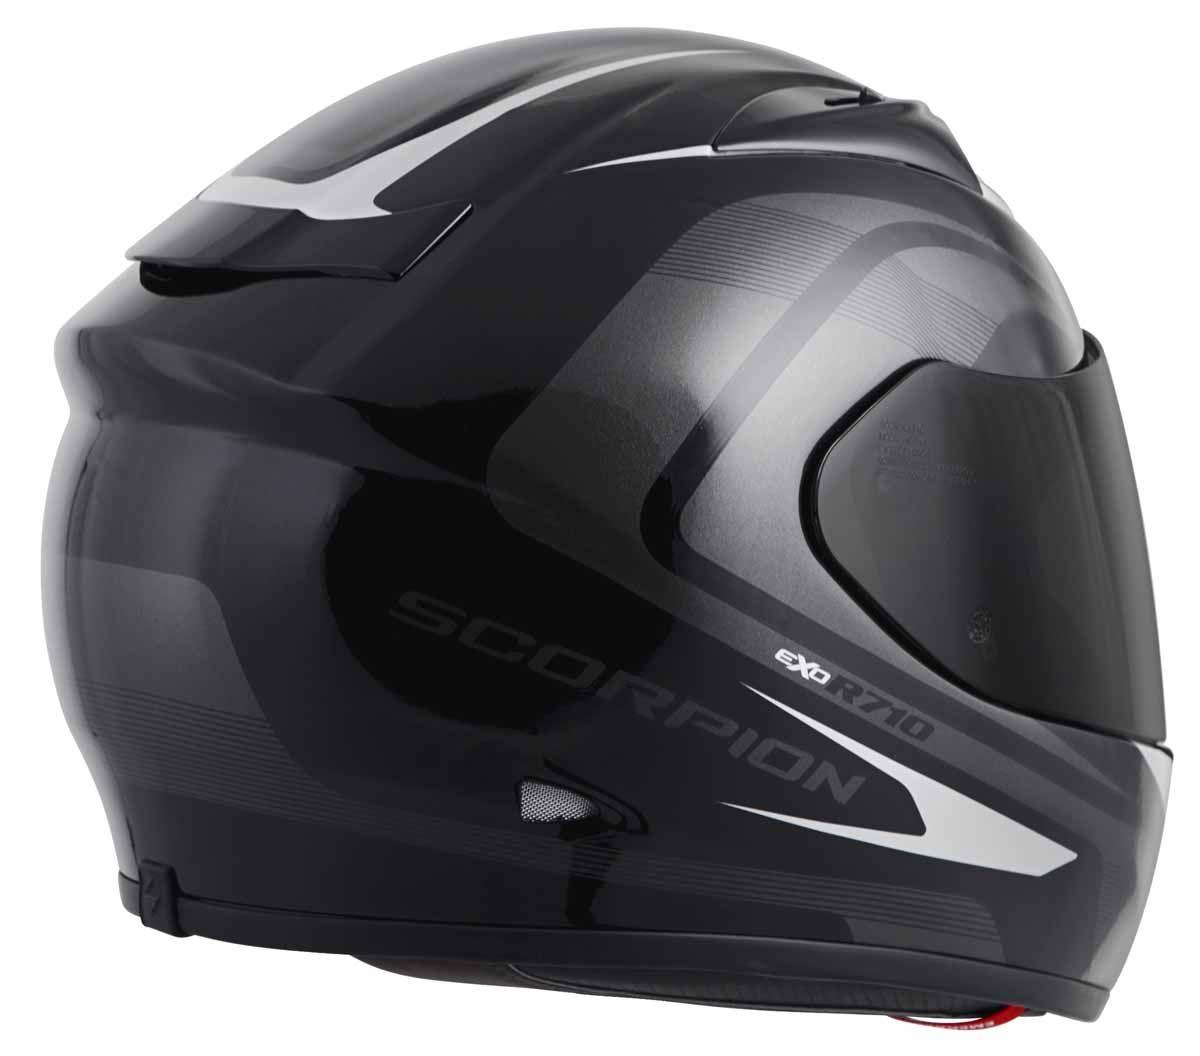 Scorpion-EXO-R710-Helmet-Fiberglass-Full-Face-DOT-SNELL-M2015-Certified-XS-2XL miniature 10